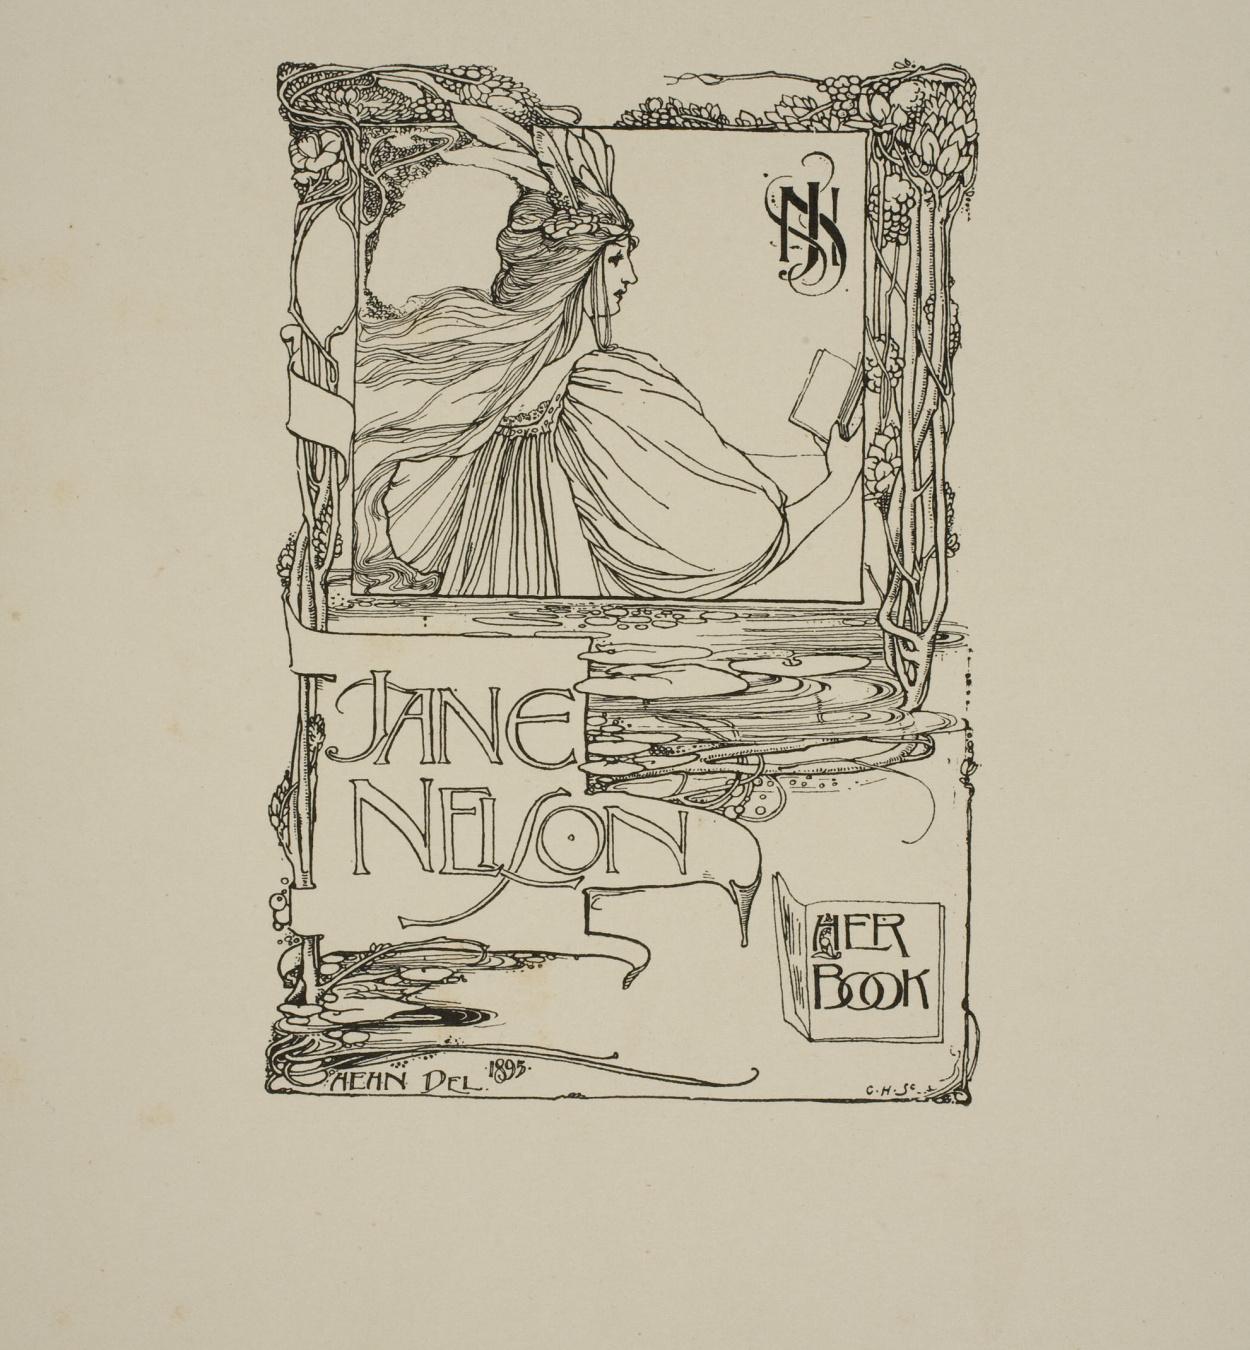 Harold E.H. Nelson - Ex-libris Jane Nelson - 1895